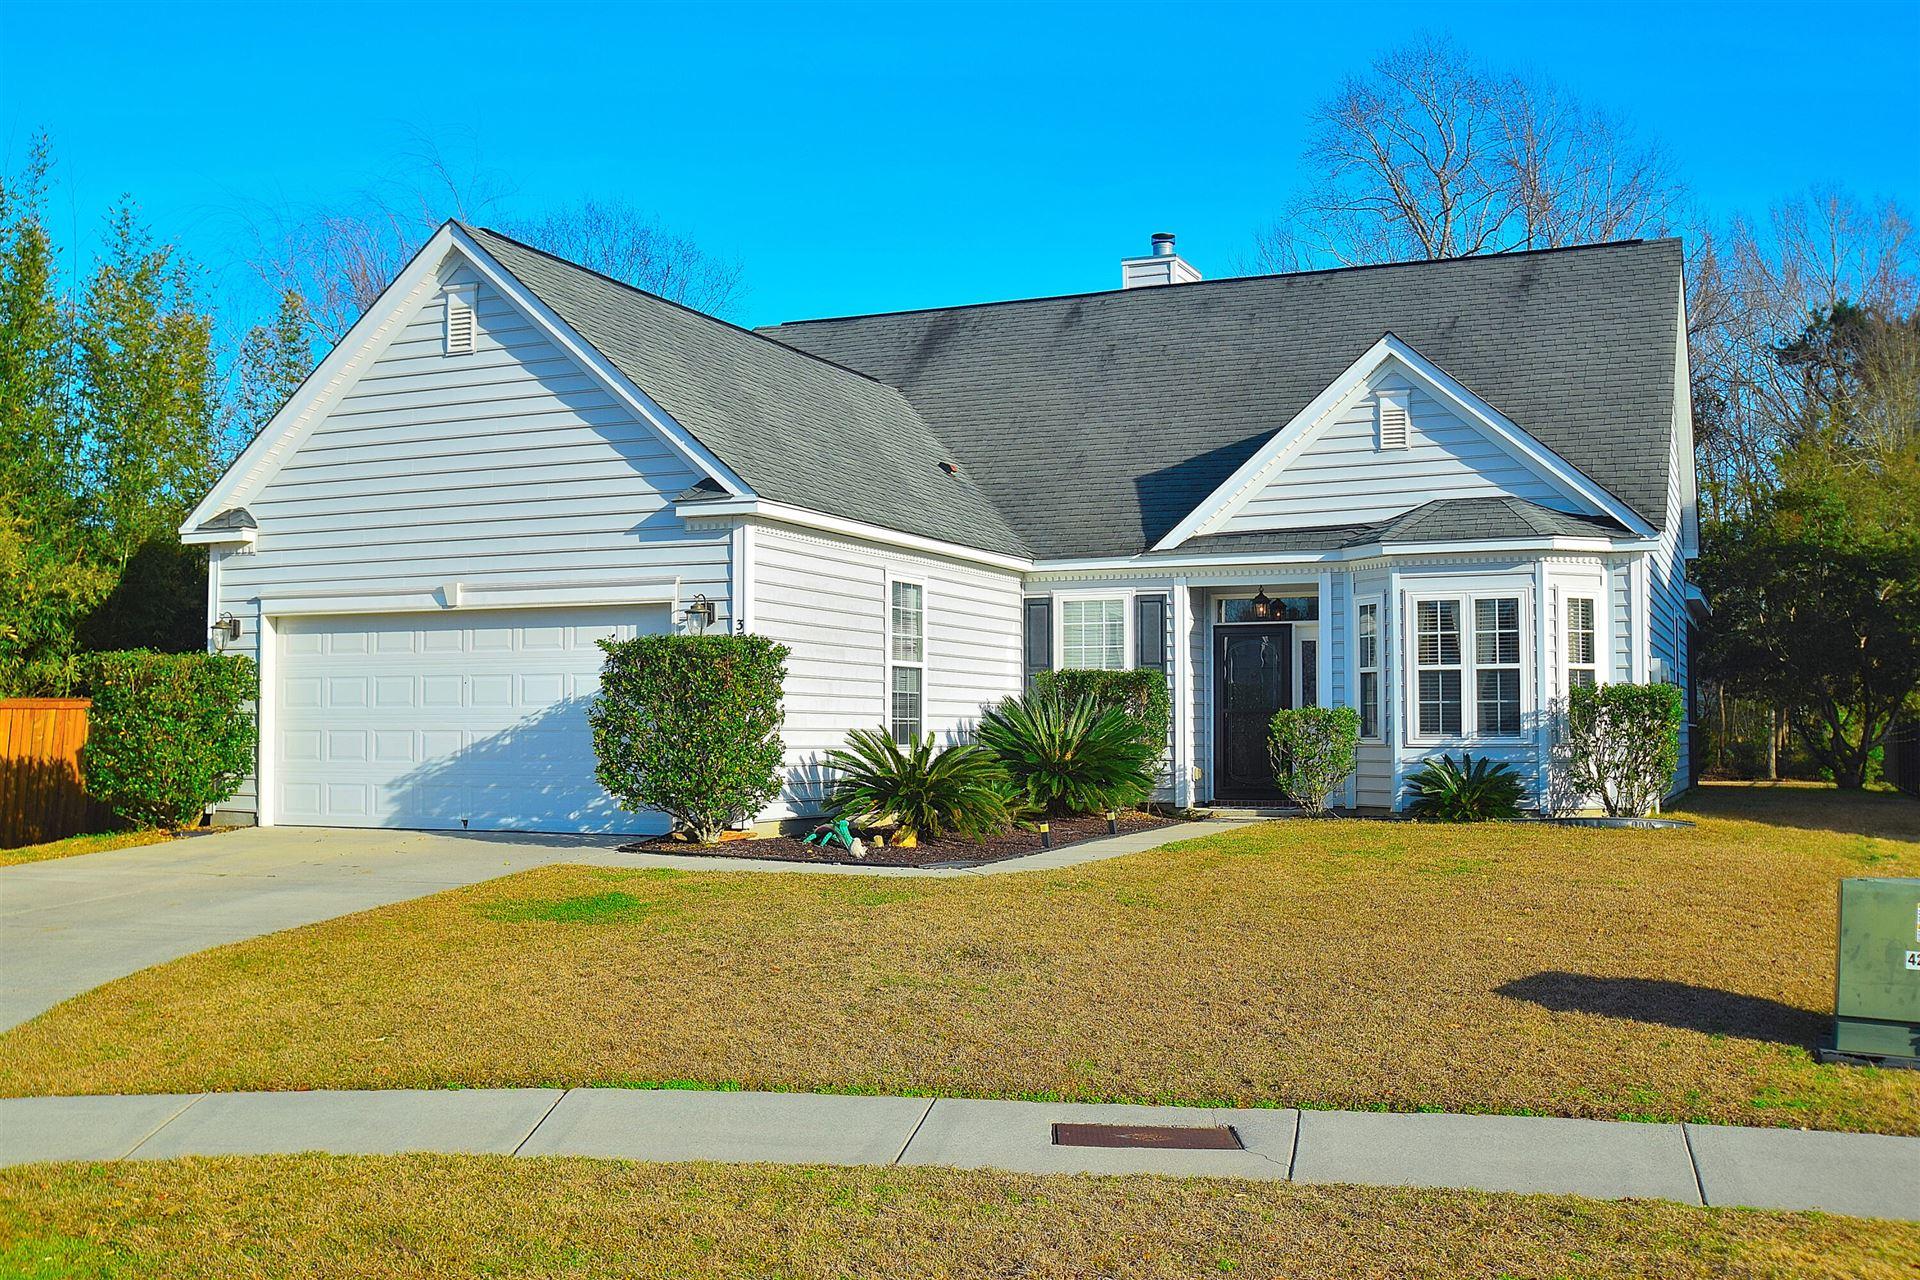 Photo of 371 Weeping Willow Way, Charleston, SC 29414 (MLS # 21005373)